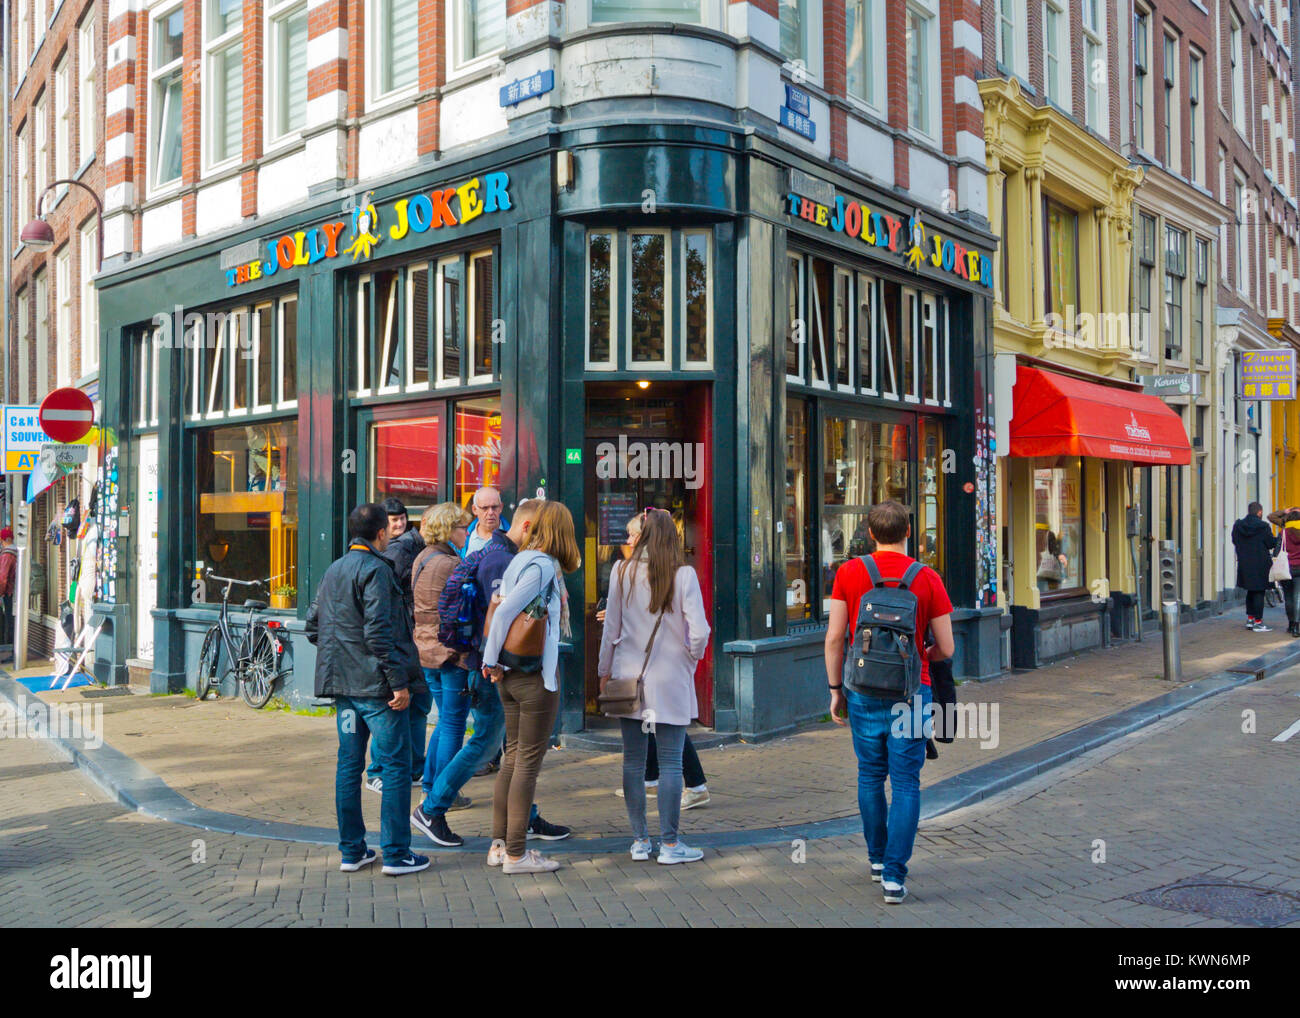 Jolly Joker coffeeshop, Nieuwmarkt, old town, Amsterdam, The Netherlands - Stock Image